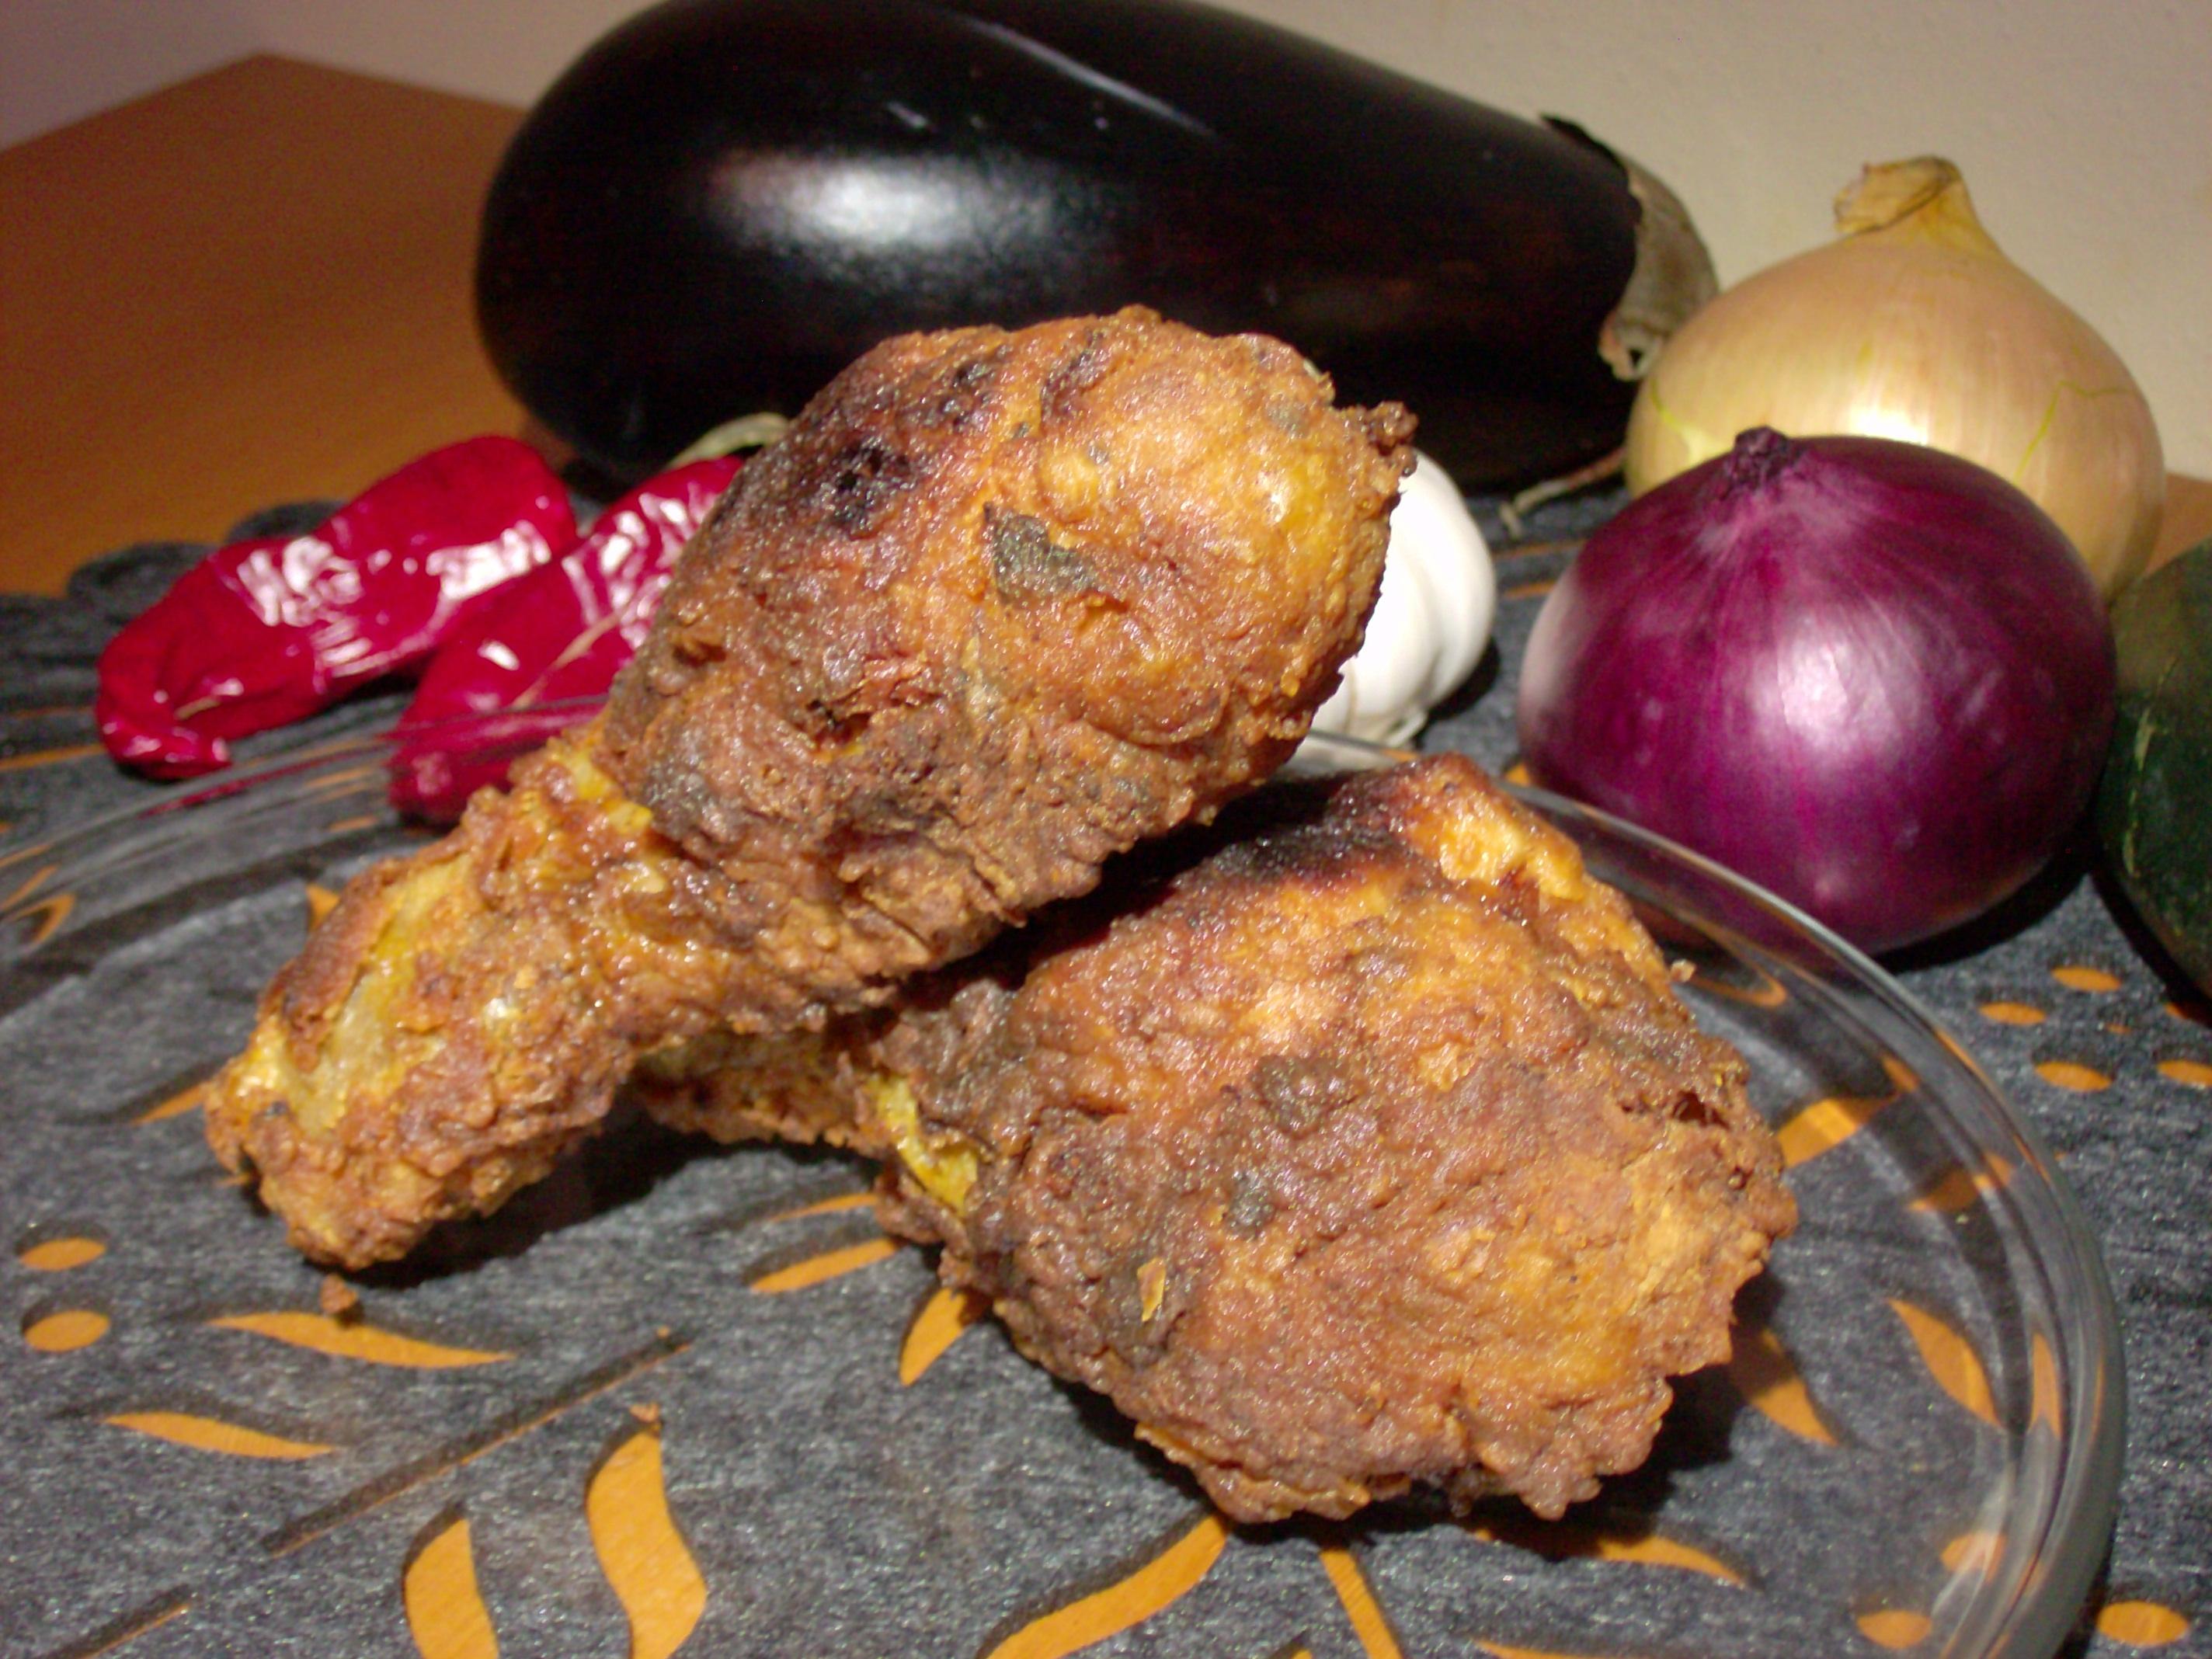 Pałki kurczaka w chrupiącej skorupce